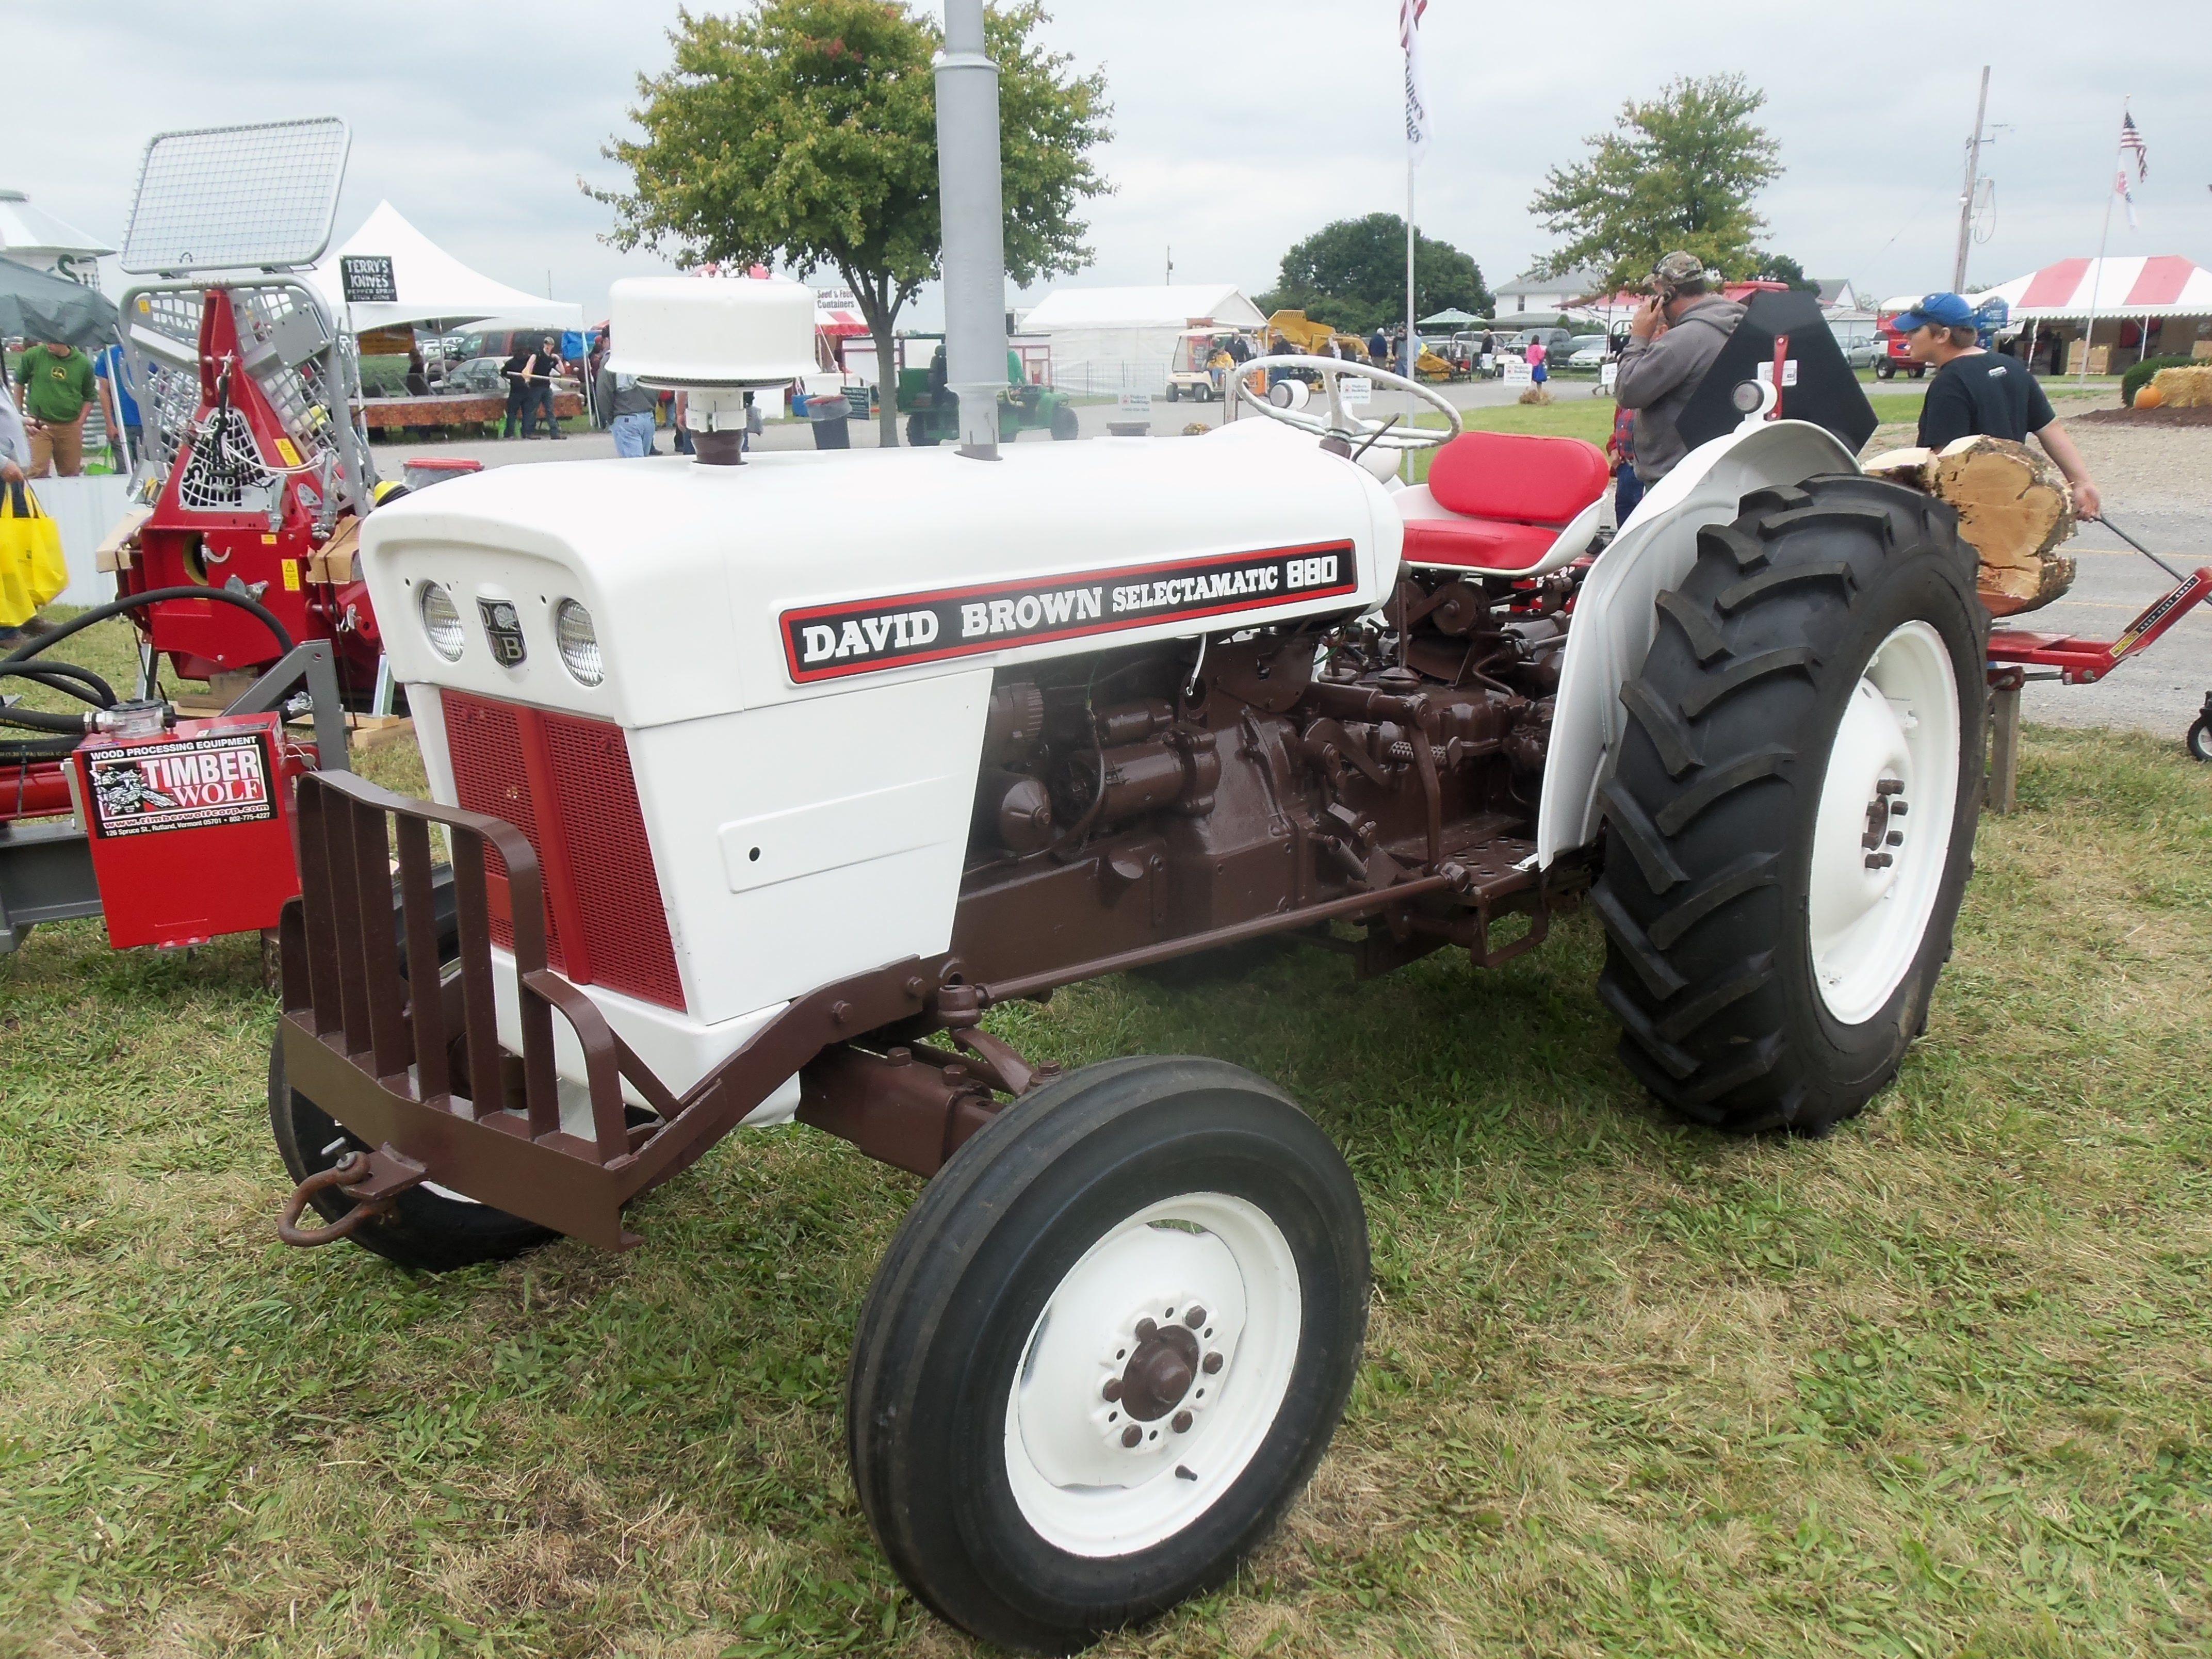 880 Ford Tractors : David brown utility tractor tractors pinterest